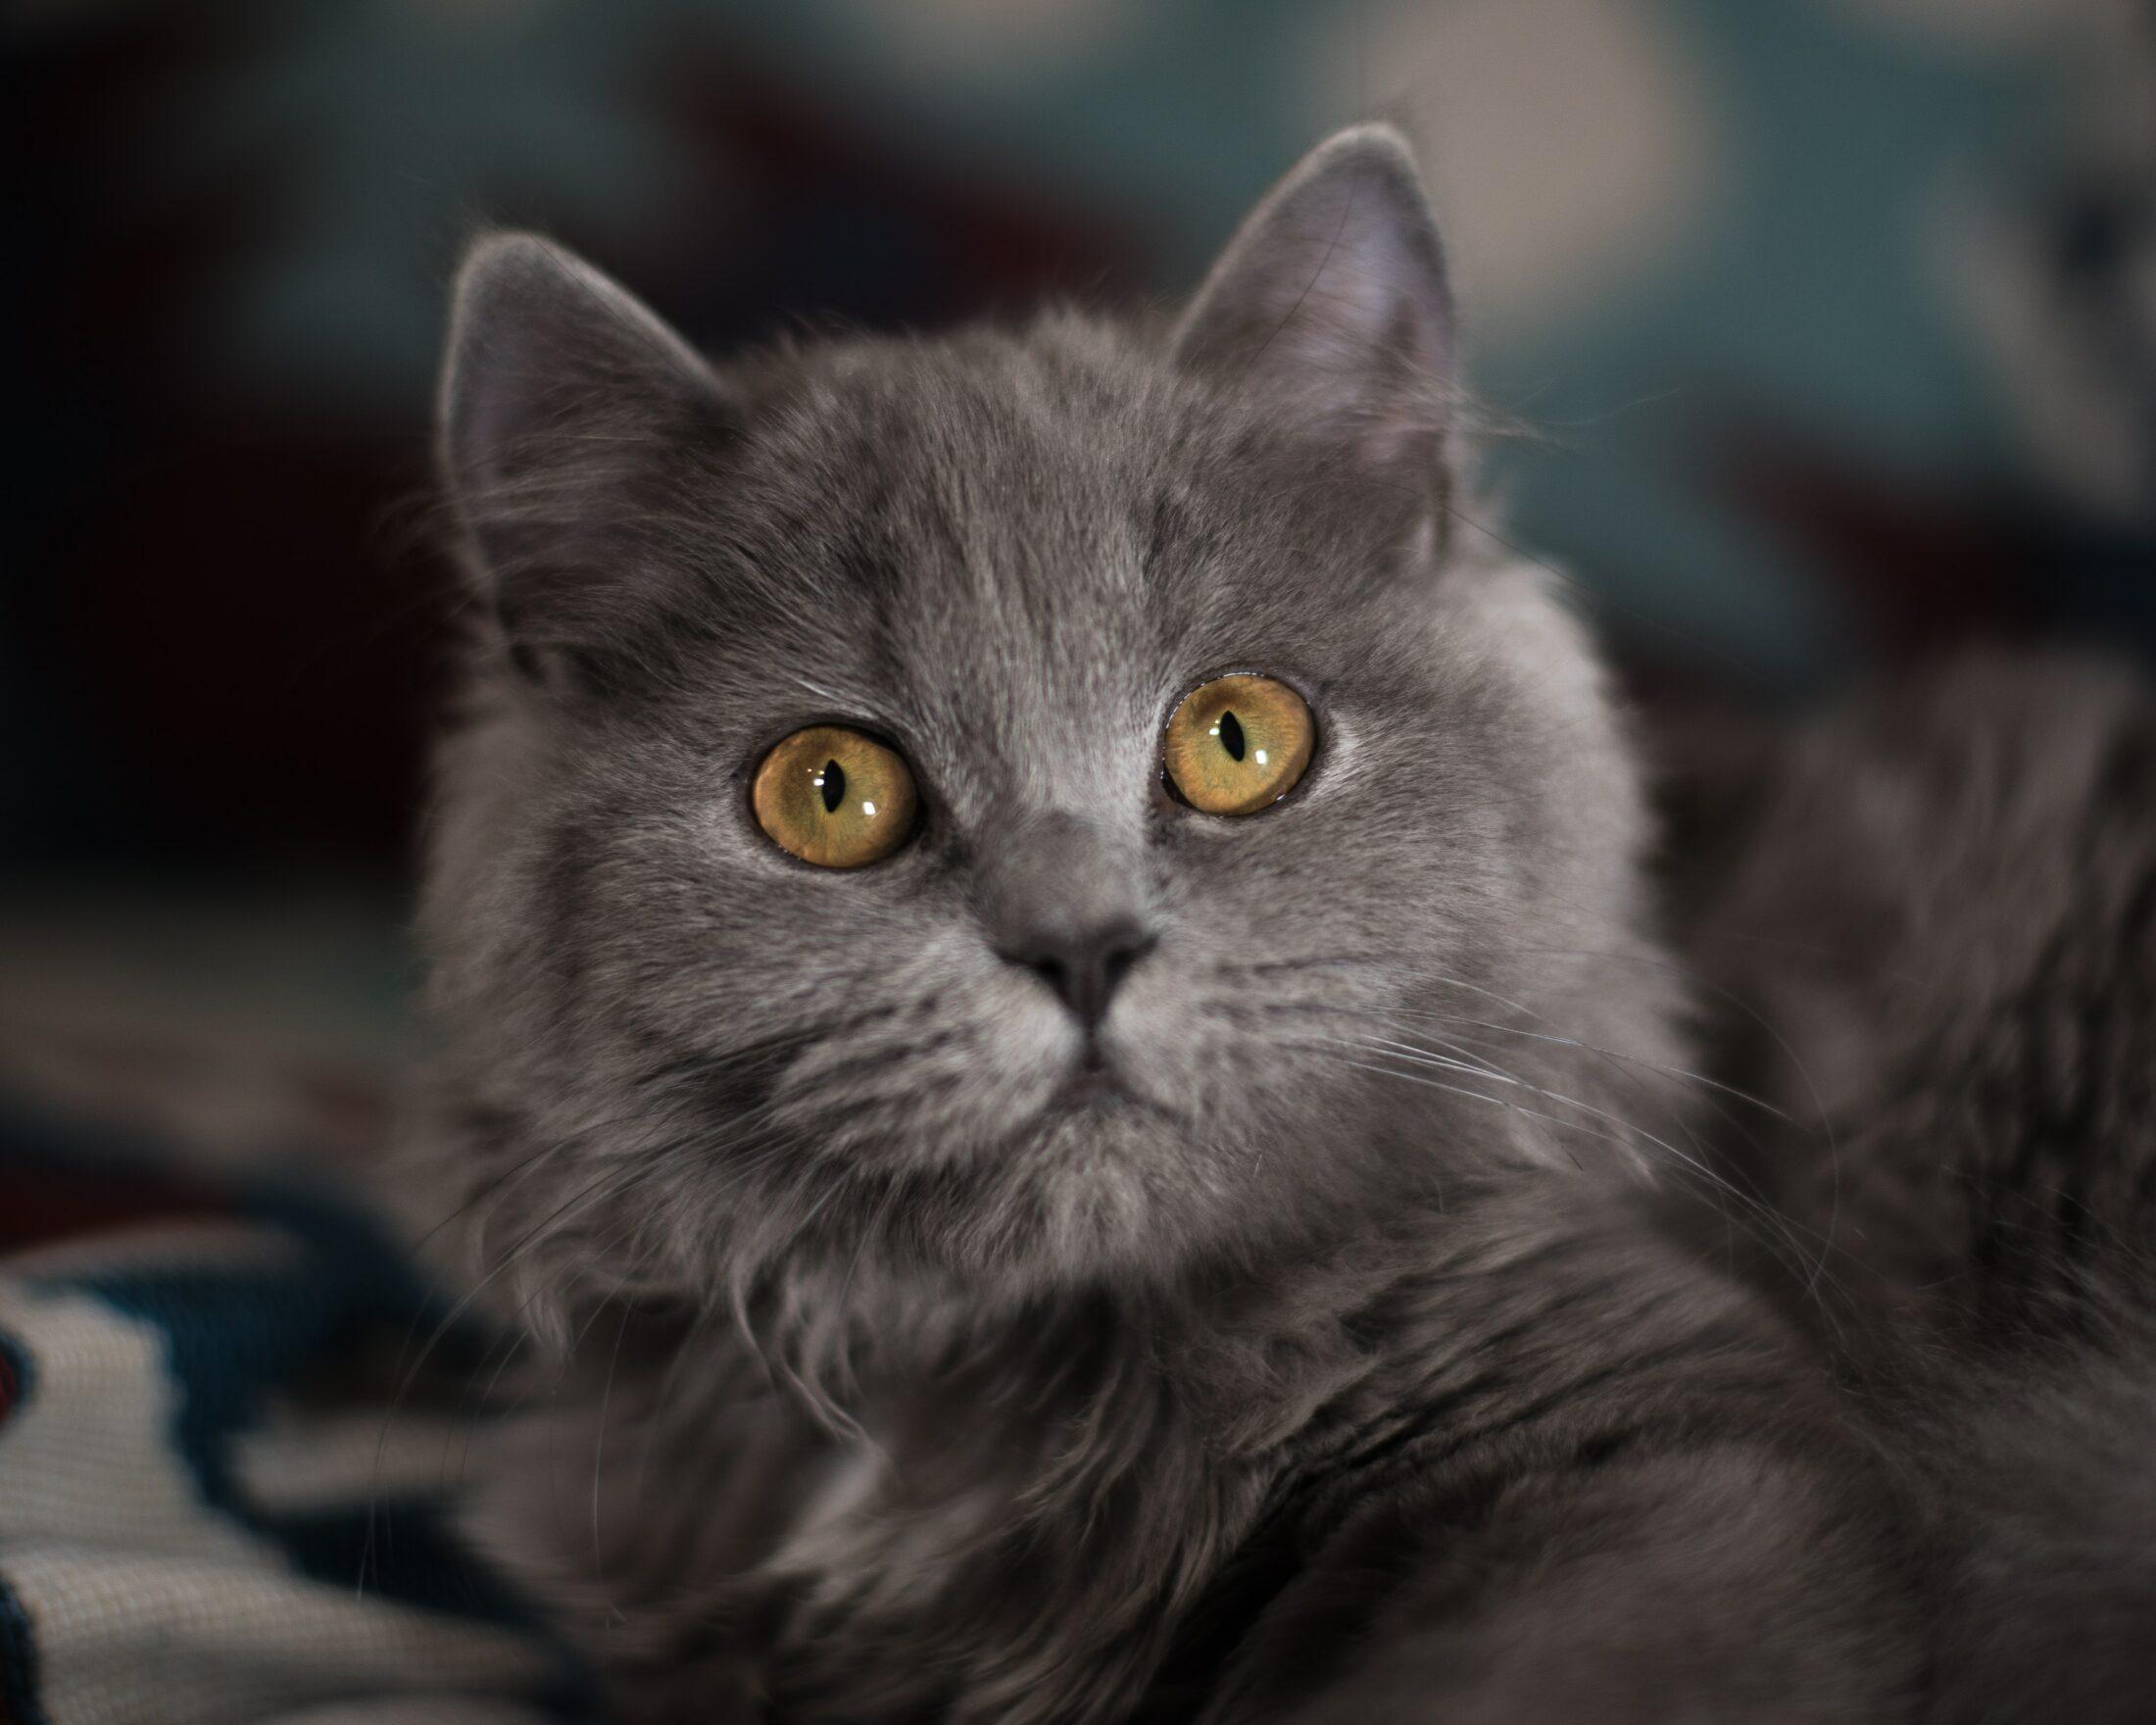 Gatos de pelos longos British Longhair